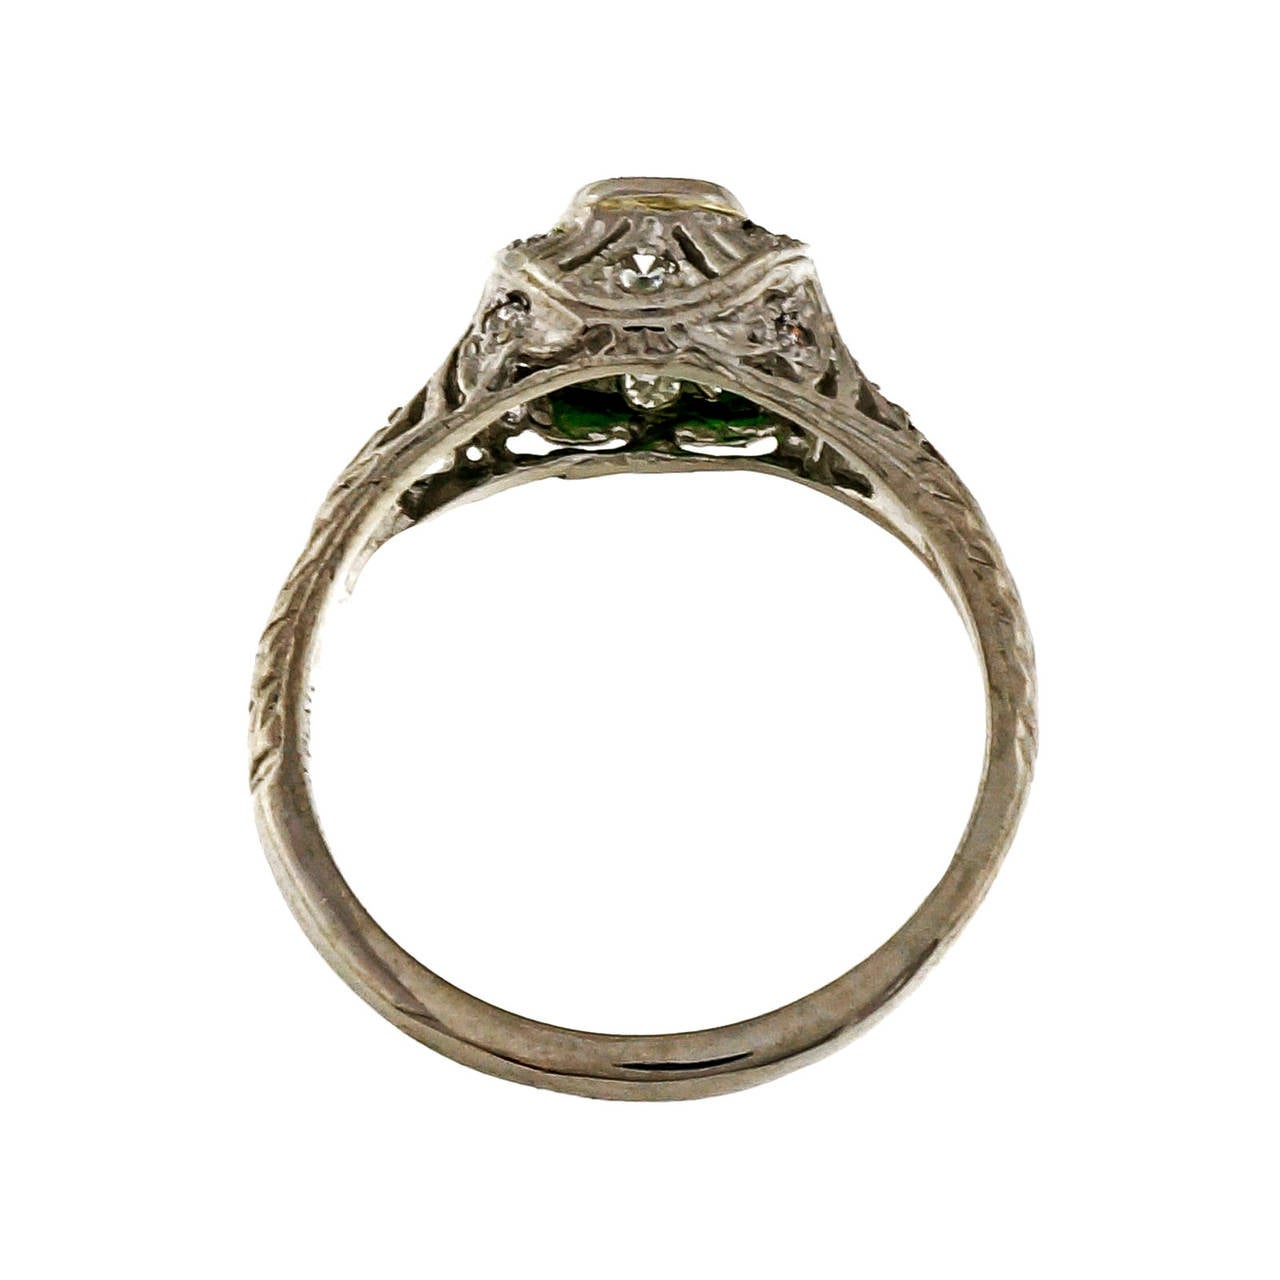 Demantoid Garnet Platinum Ring In Good Condition For Sale In Stamford, CT